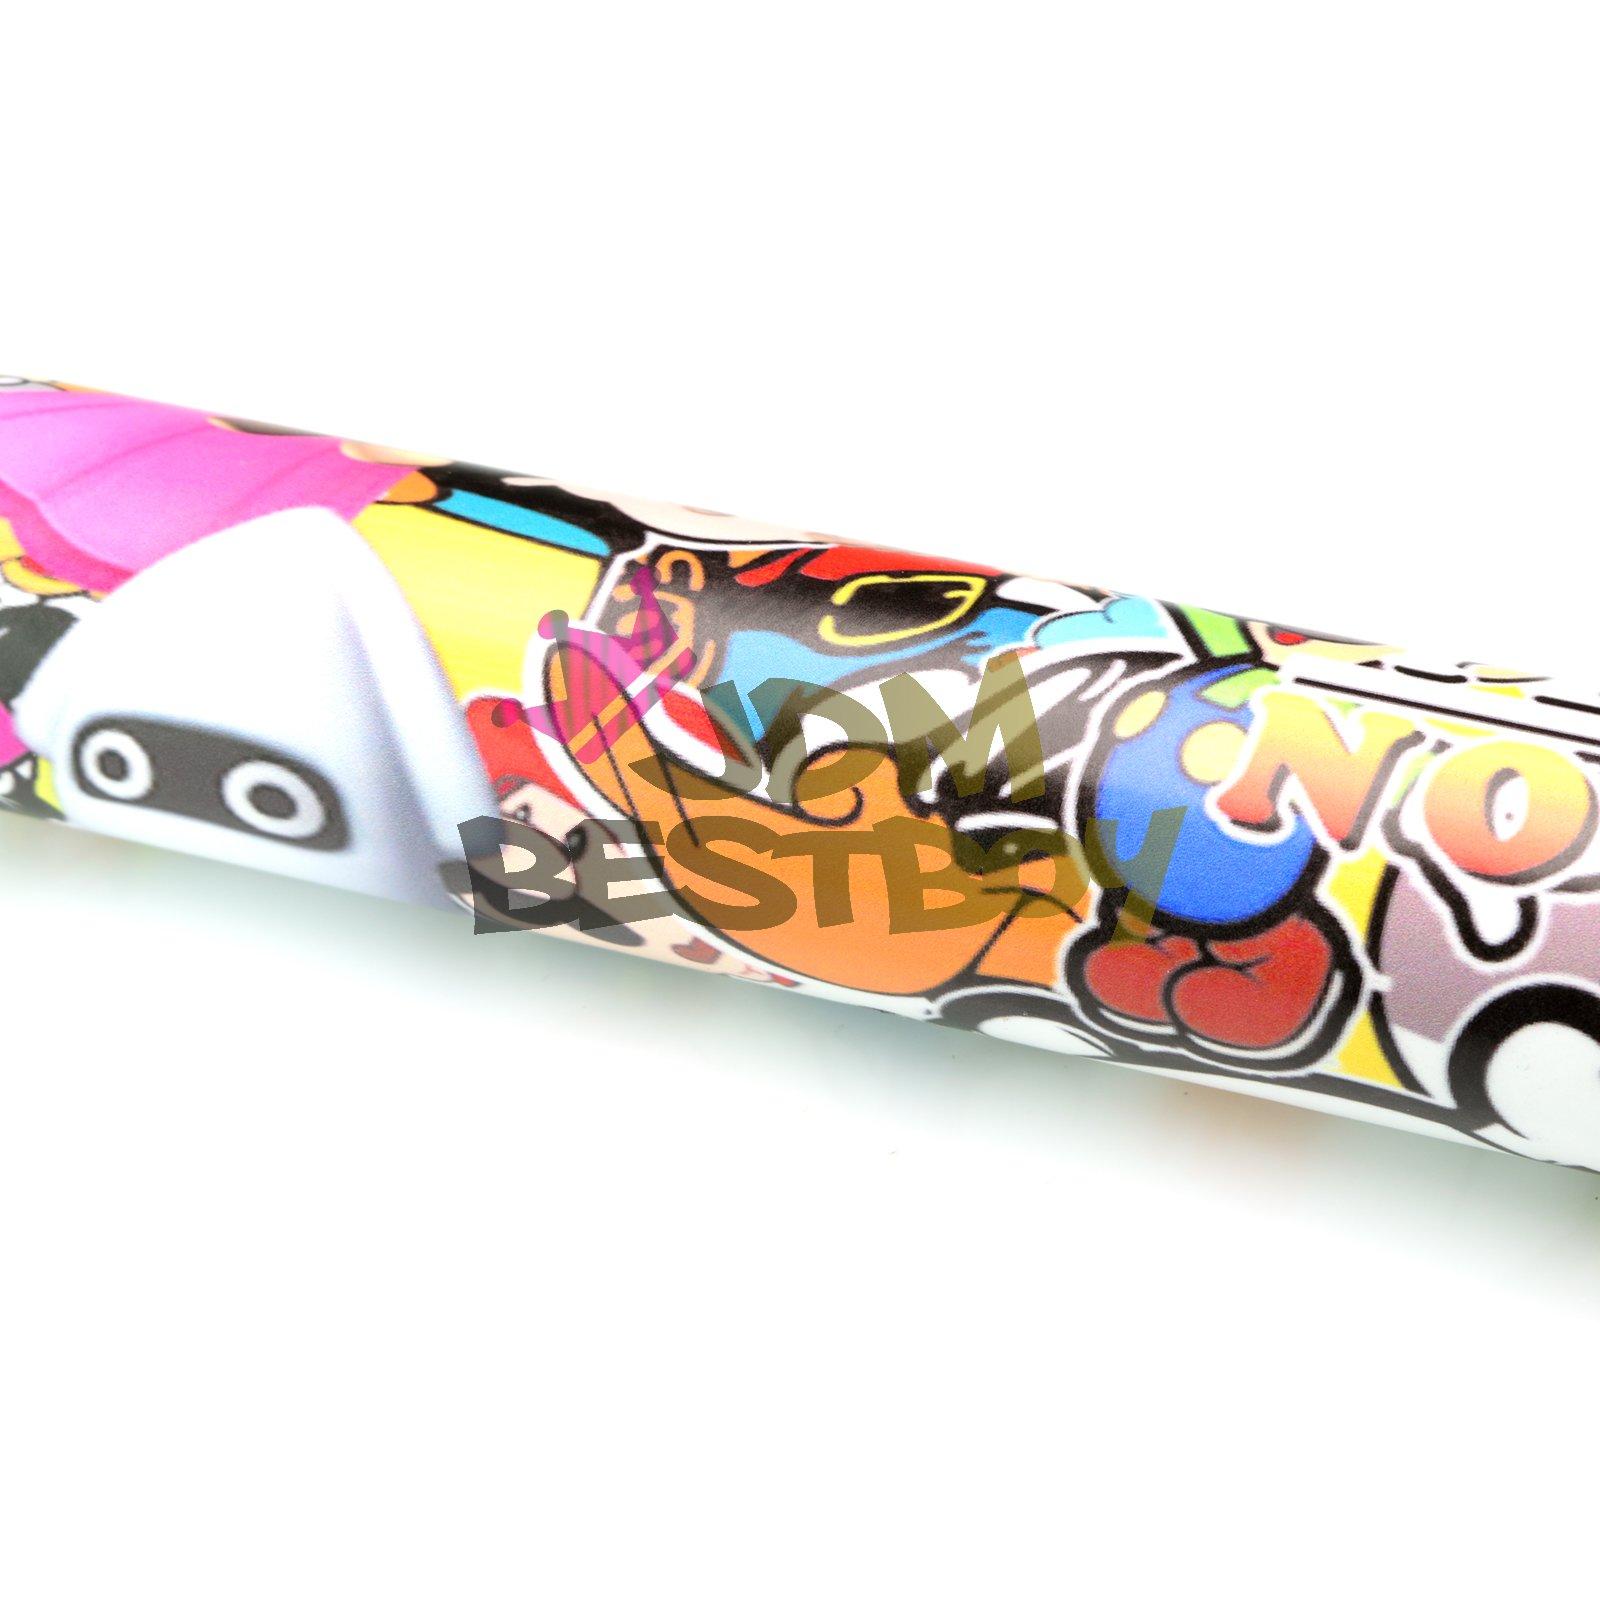 Free Tool Kit MAO JDM Bomber Anime Graffiti Cartoon Car Auto Laptop Vinyl Wrap Sticker Decal Film Sheet - 60''X600'' by JDMBESTBOY (Image #2)